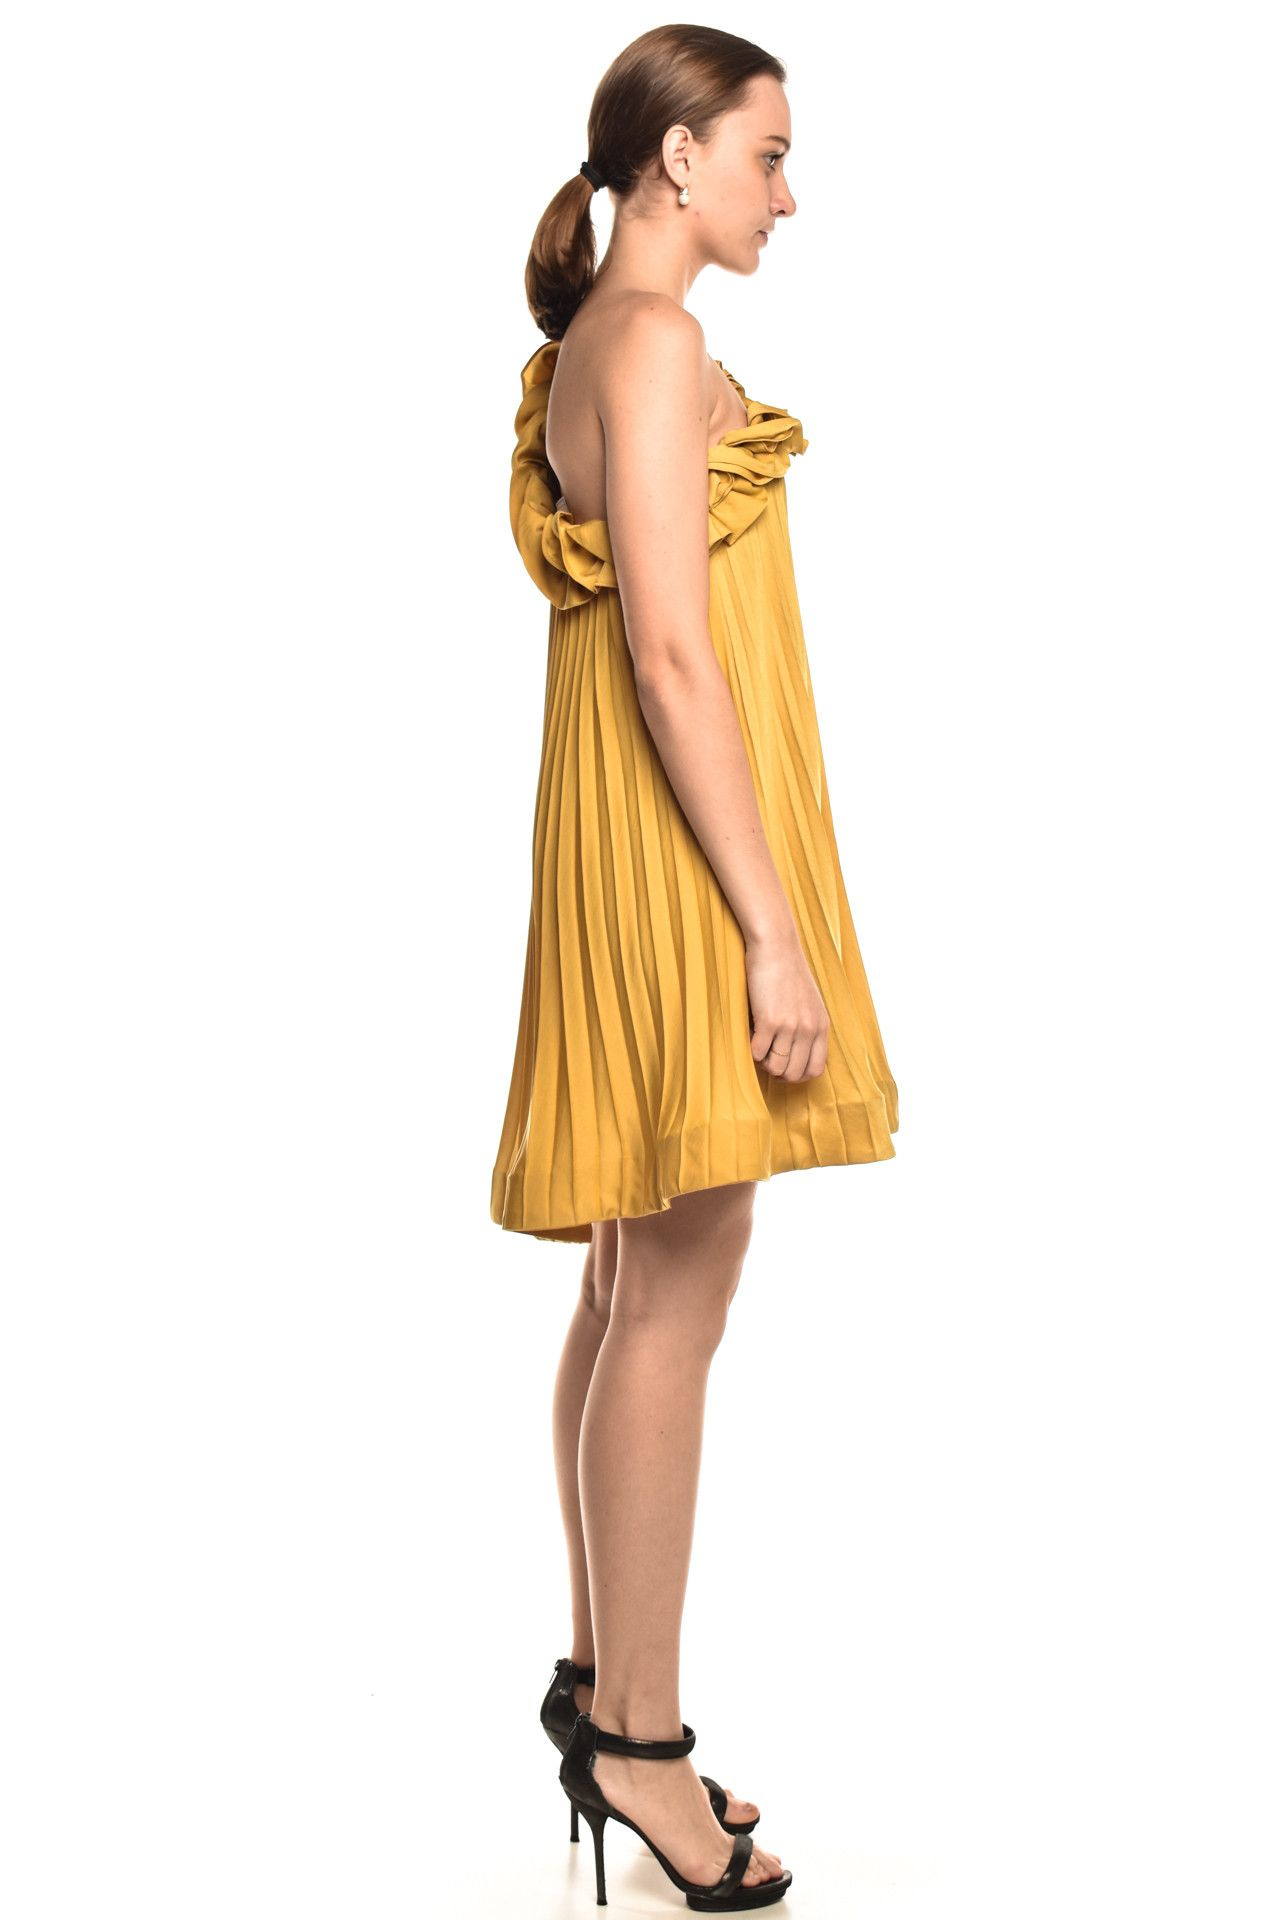 Bcbgmaxazria - Vestido Babados Yellow - Foto 4